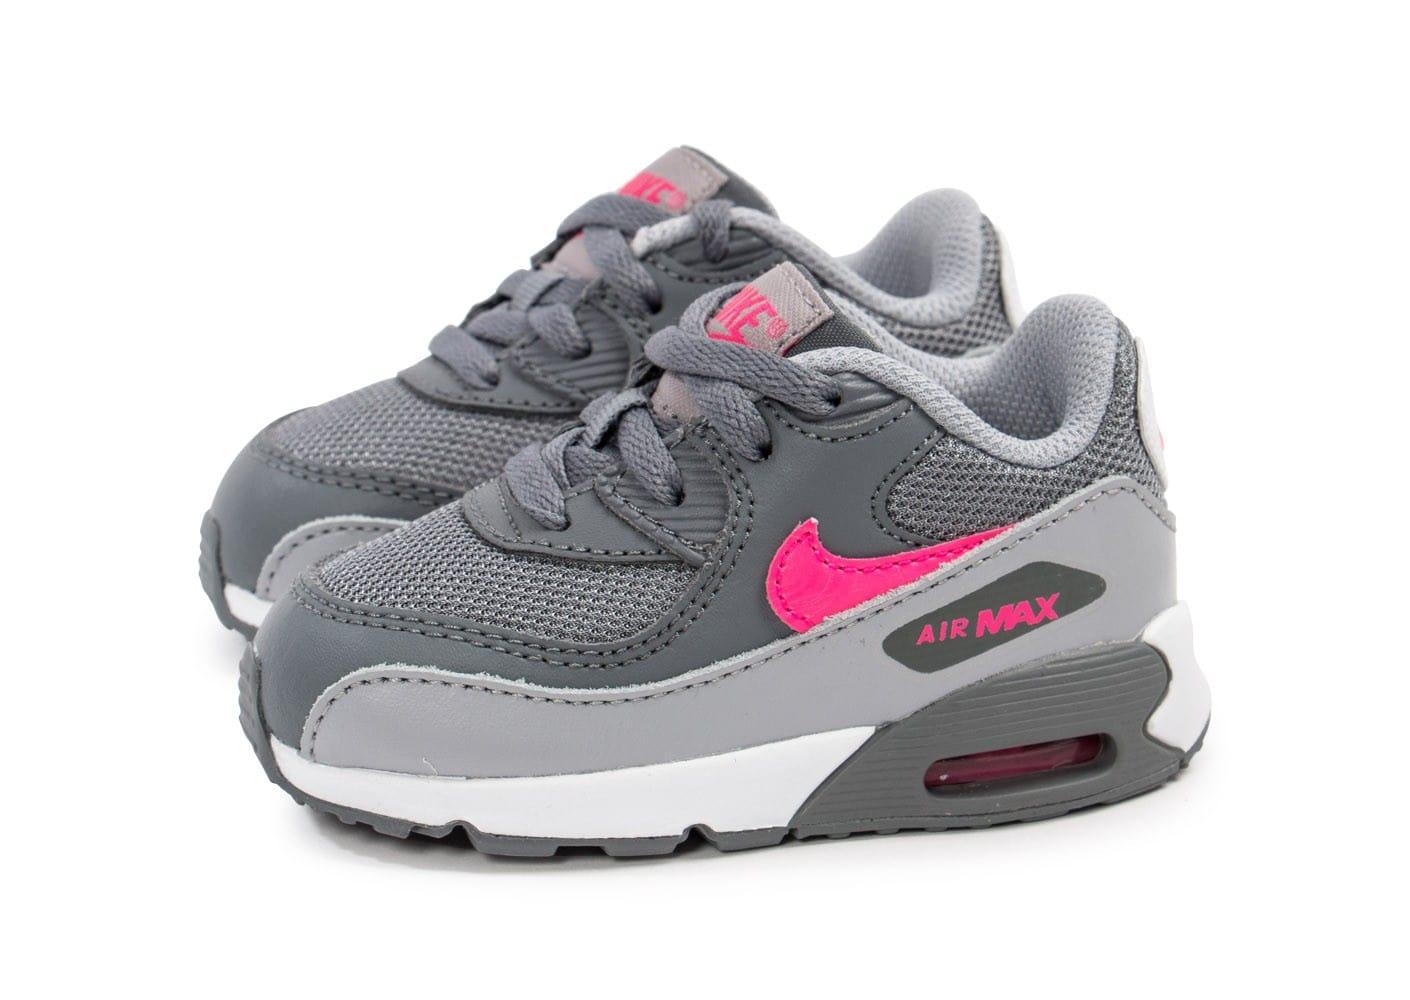 more photos 18676 b4e9b Nike Air Max 90 (2c-10c) Toddler Boys u0027 Shoe Chaussures Chaussures Nike  Chaussure Huarache Pour Bébé Petit Bébé Petit Gar on Prix Pour Gar on